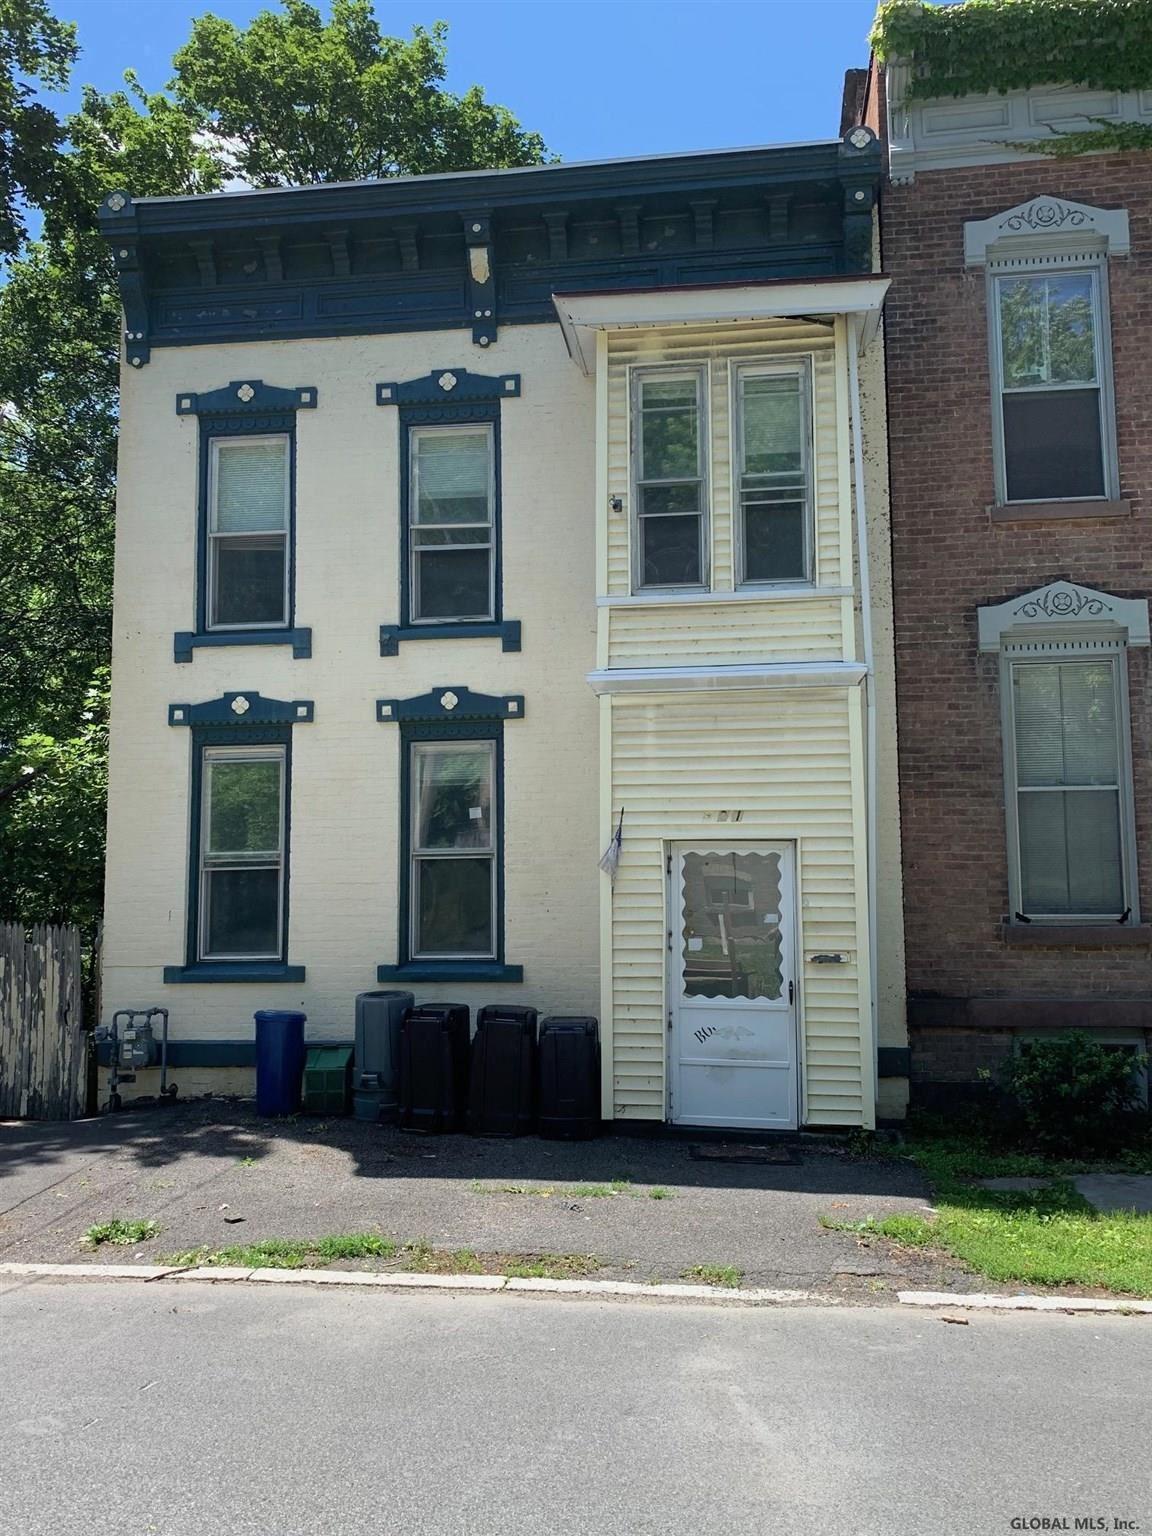 201 TENTH ST, Troy, NY 12180-2914 - #: 202122075